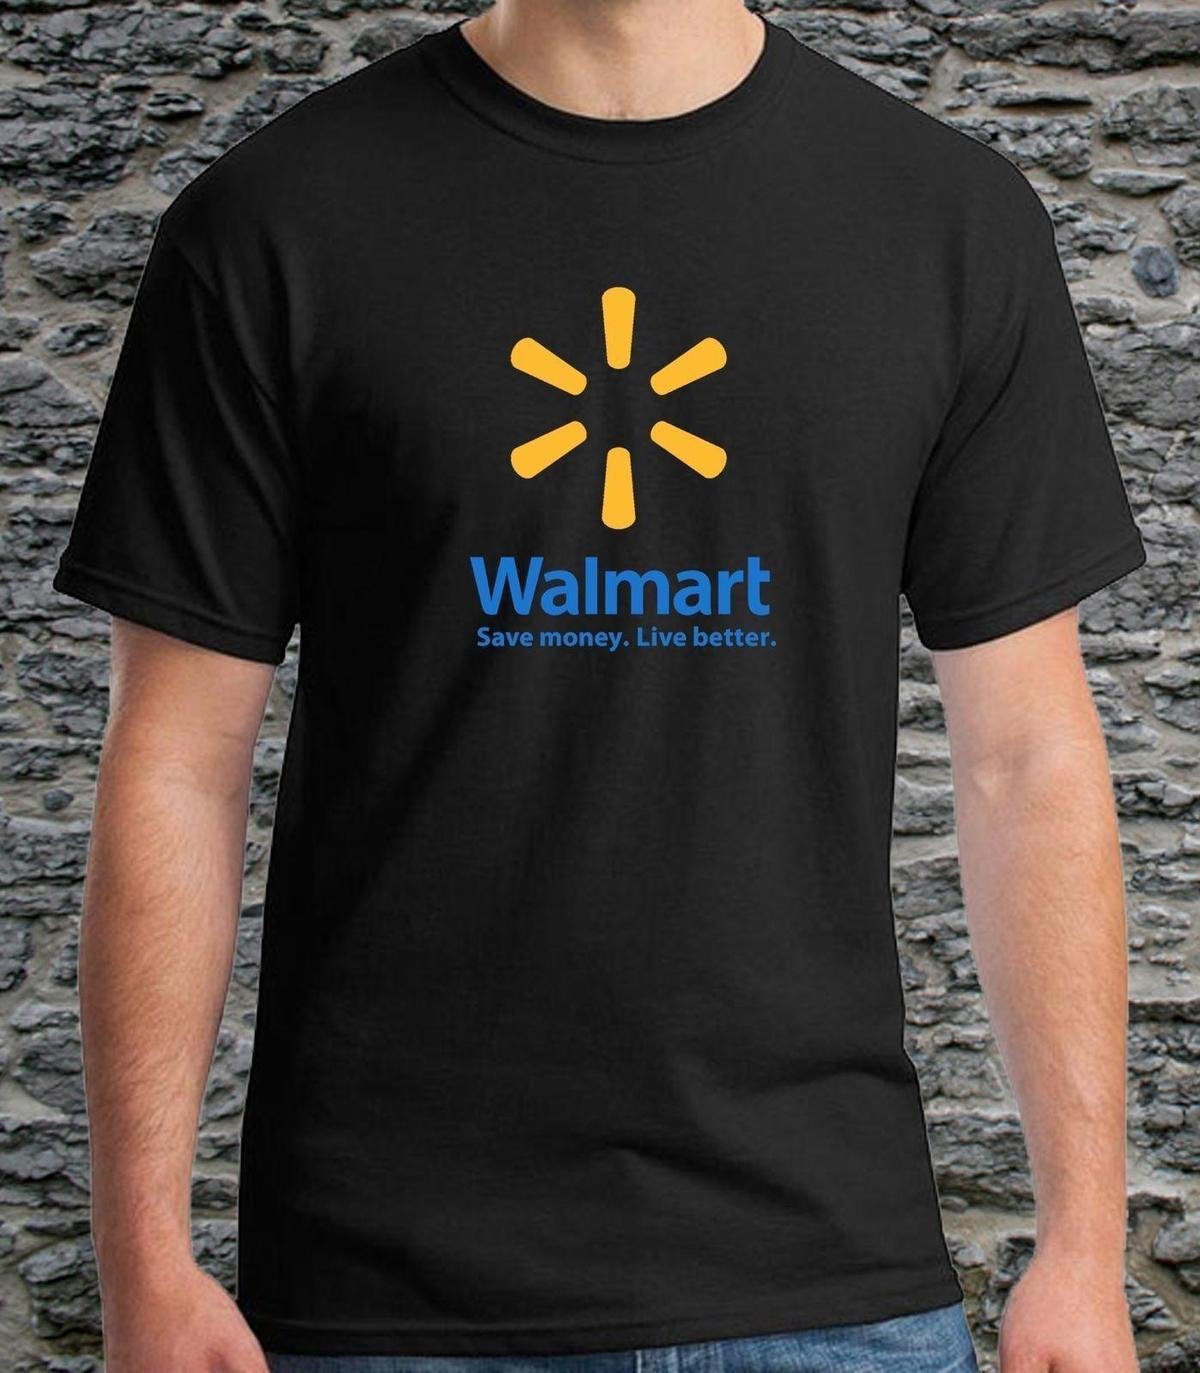 c42a1e18 NEW Walmart Market Store Furniture T Shirt Black Men'S Size S 3XL ...